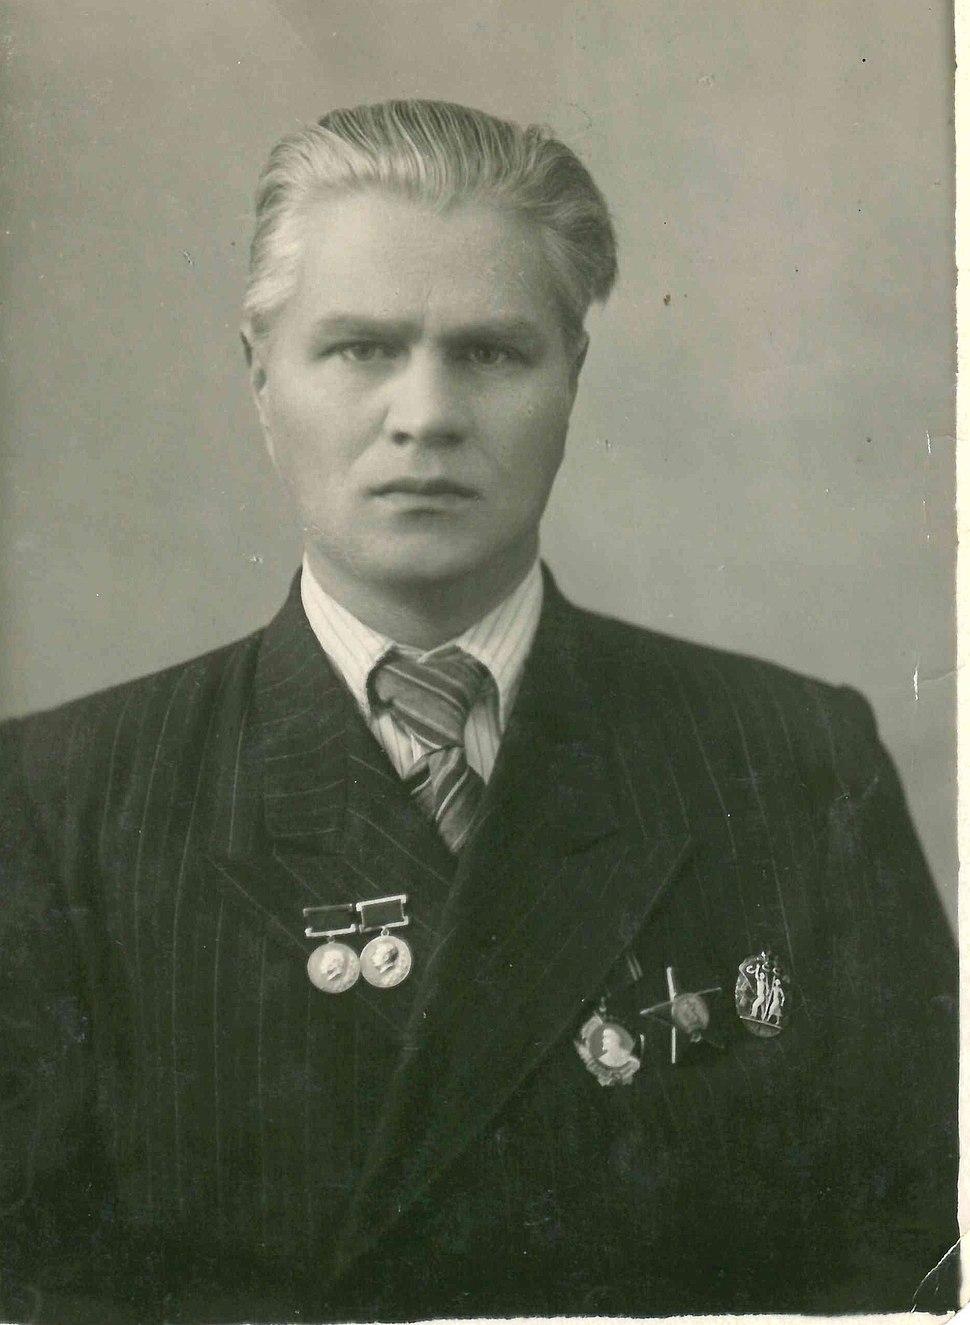 970px pestryakov vladimir borisovich 1958